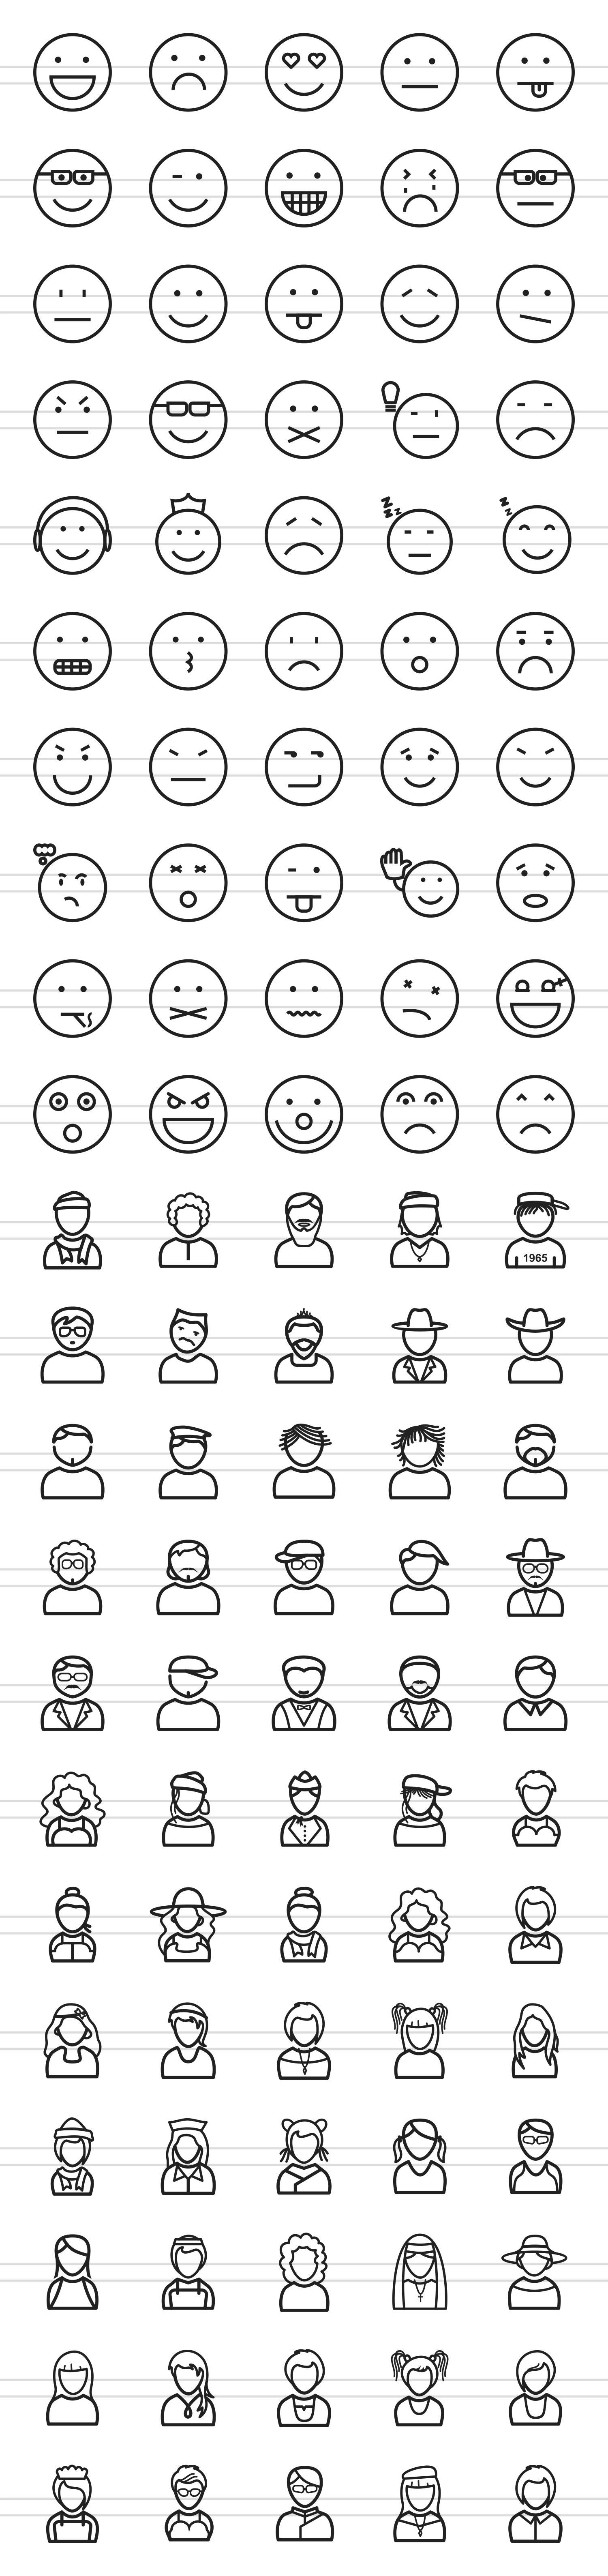 110 Avatars & Emoticons Line Icons example image 2